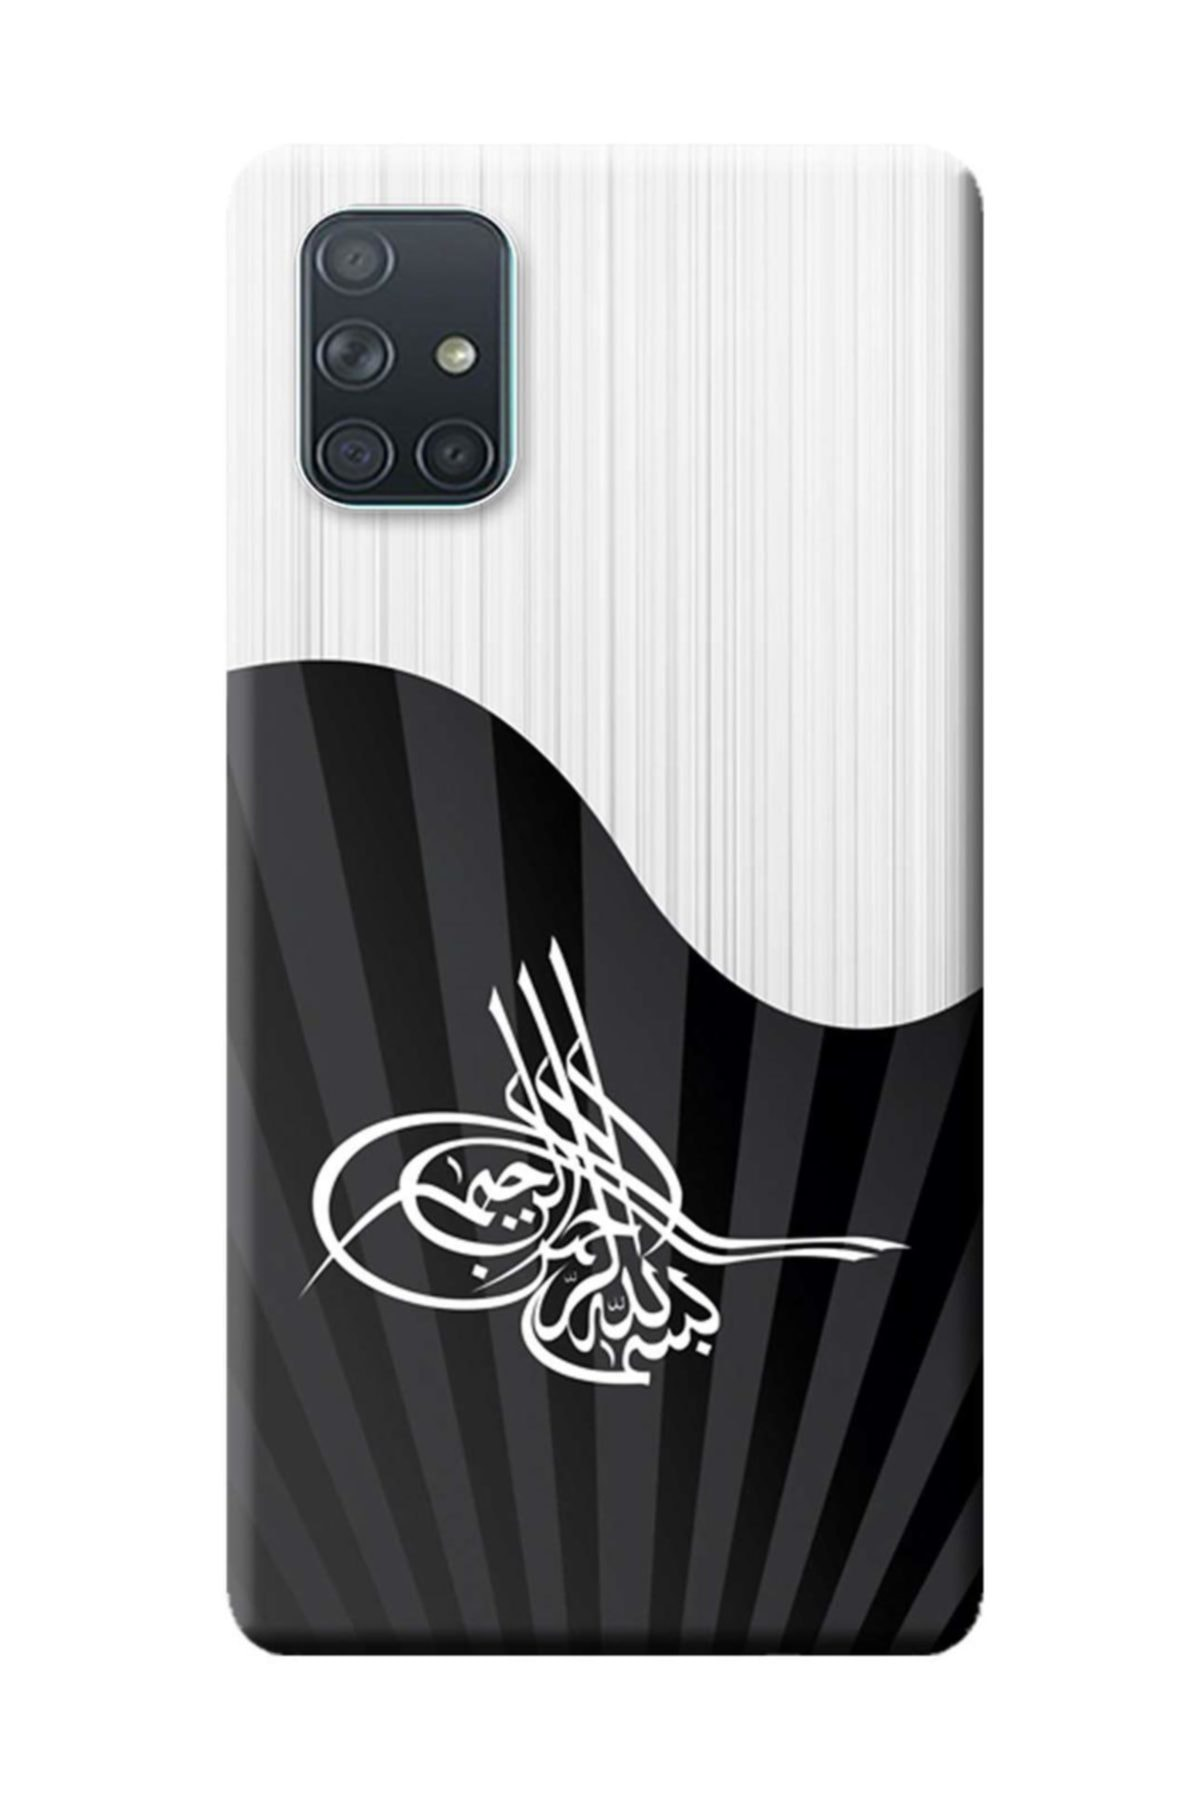 Kılıfmerkezi Samsung Galaxy A51 Kılıf Sm-a515f Desen Baskılı Silikon Tuğra Tasarım 1